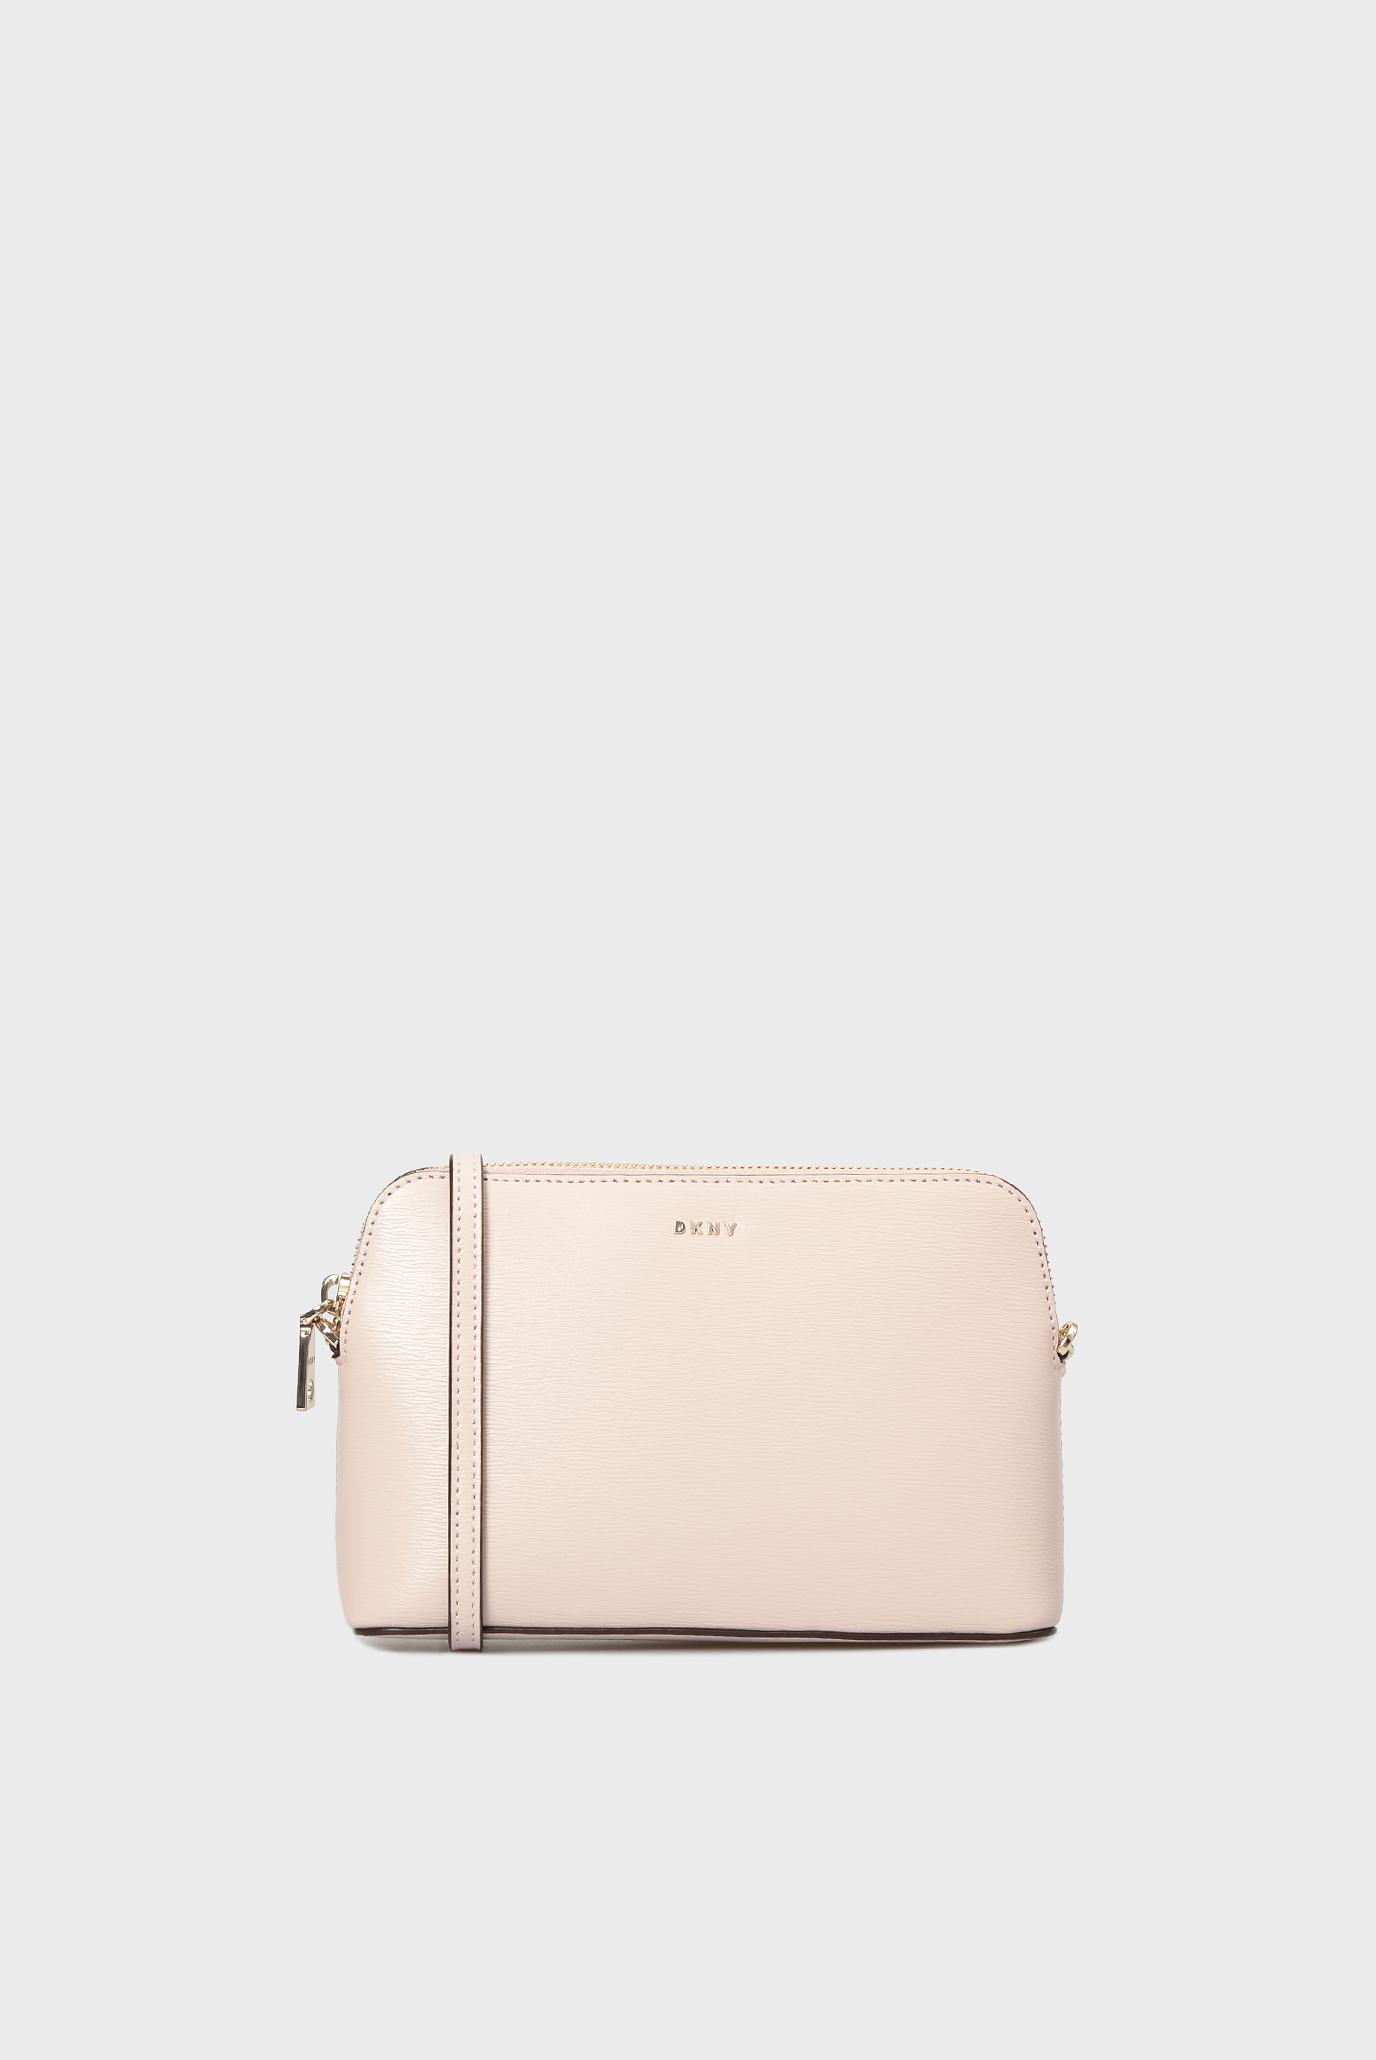 b8721286e1e1 Купить Женская розовая кожаная сумка через плечо BRYANT-DOME DKNY DKNY  R83E3655 – Киев, Украина. Цены в интернет магазине MD Fashion